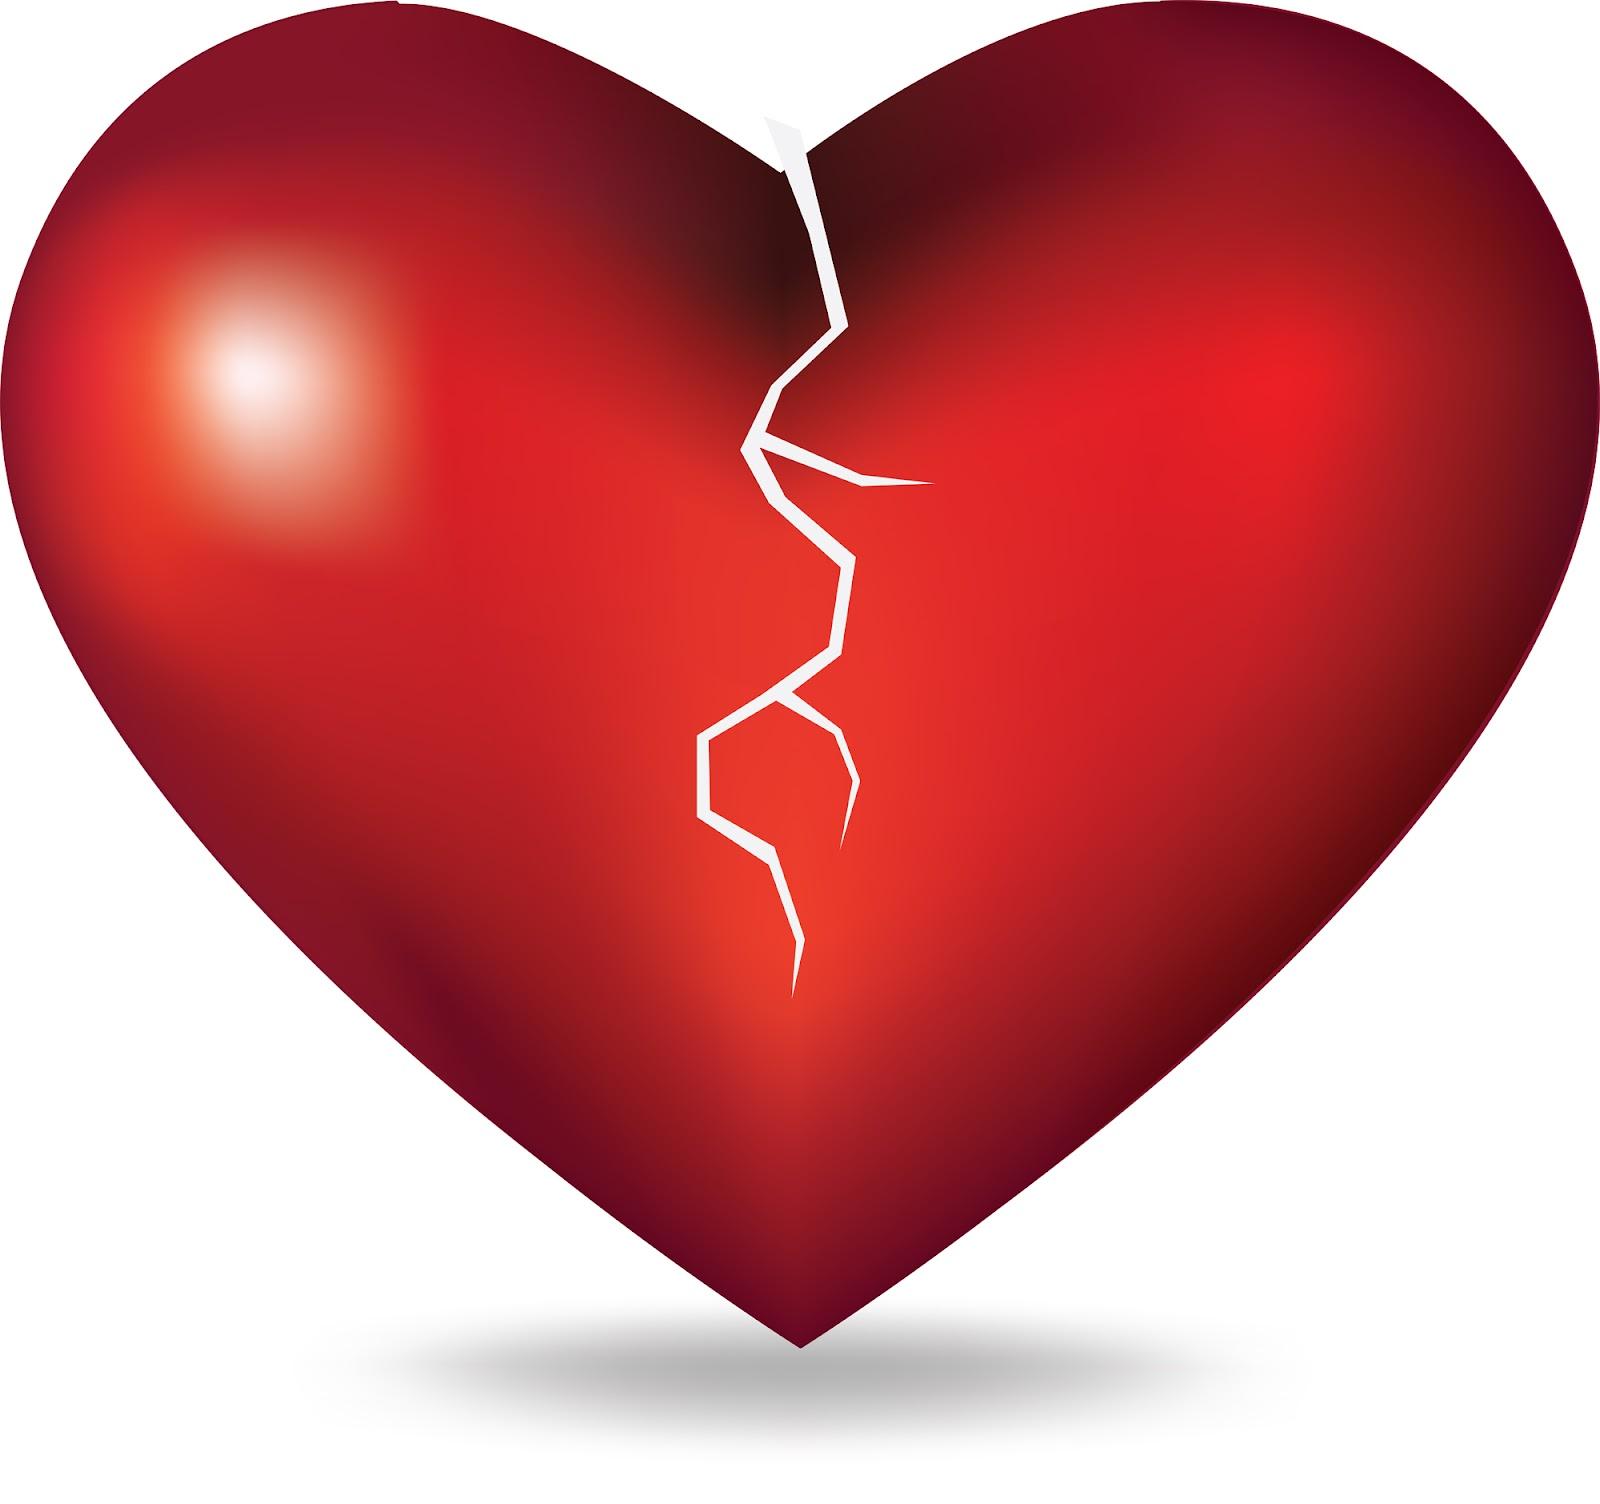 5 obiceiuri care iti distrug inima